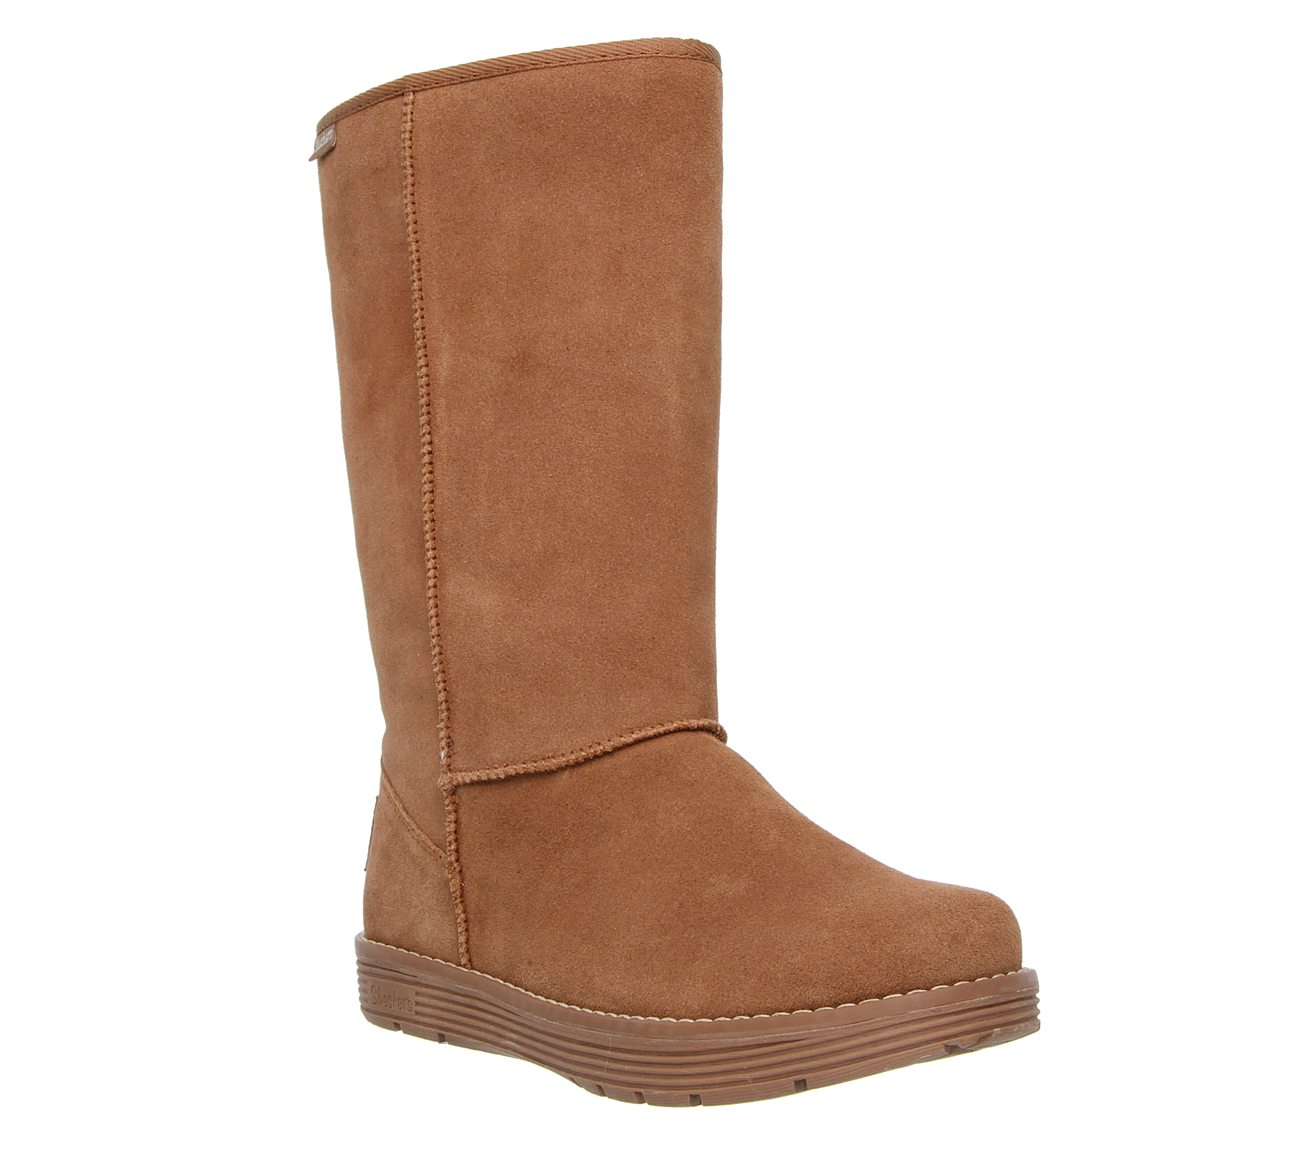 sale Gute Preise Temperament Schuhe Adorbs - Femme